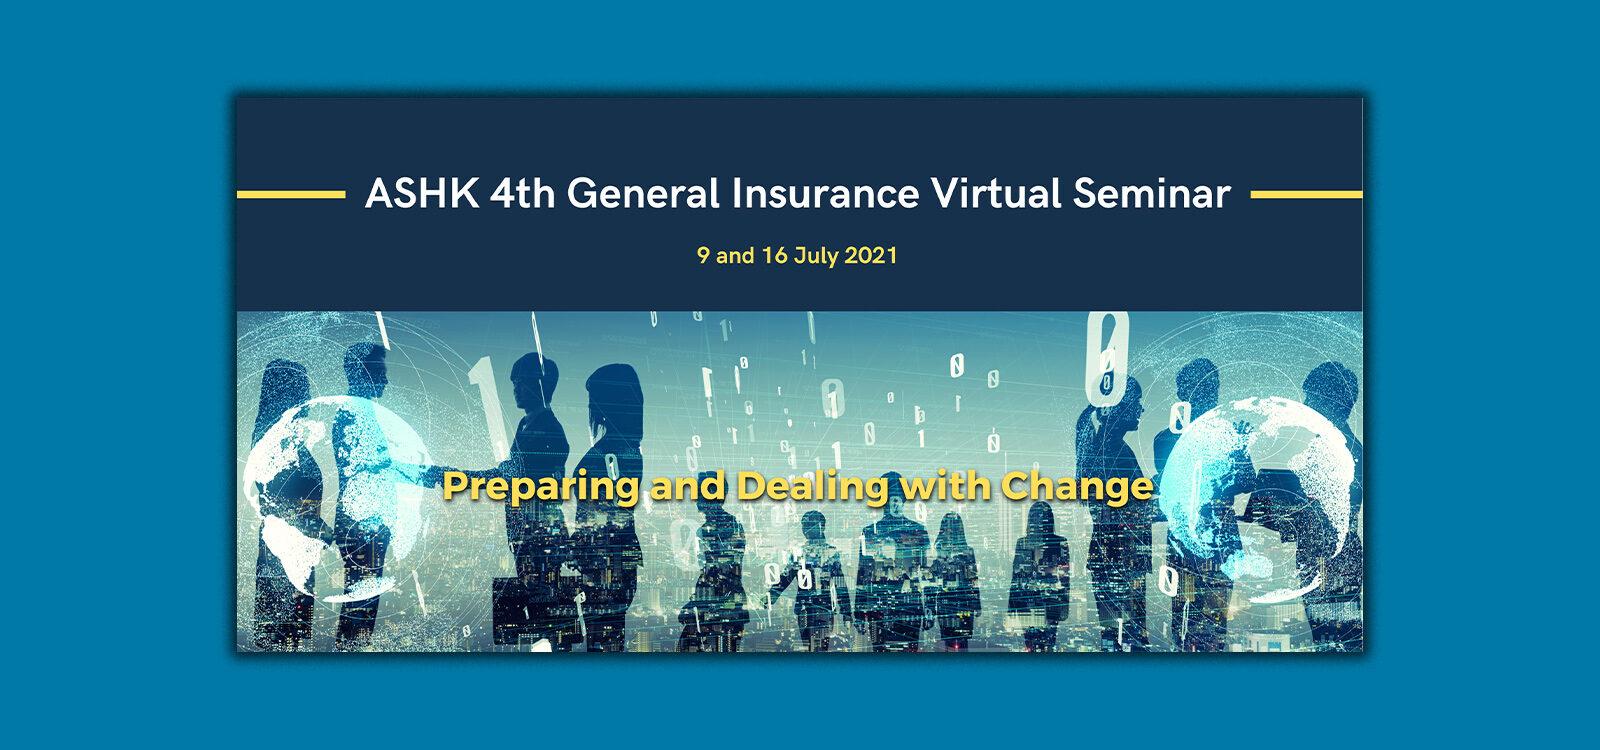 Thoughts from the ASHK 4th General Insurance Virtual Seminar